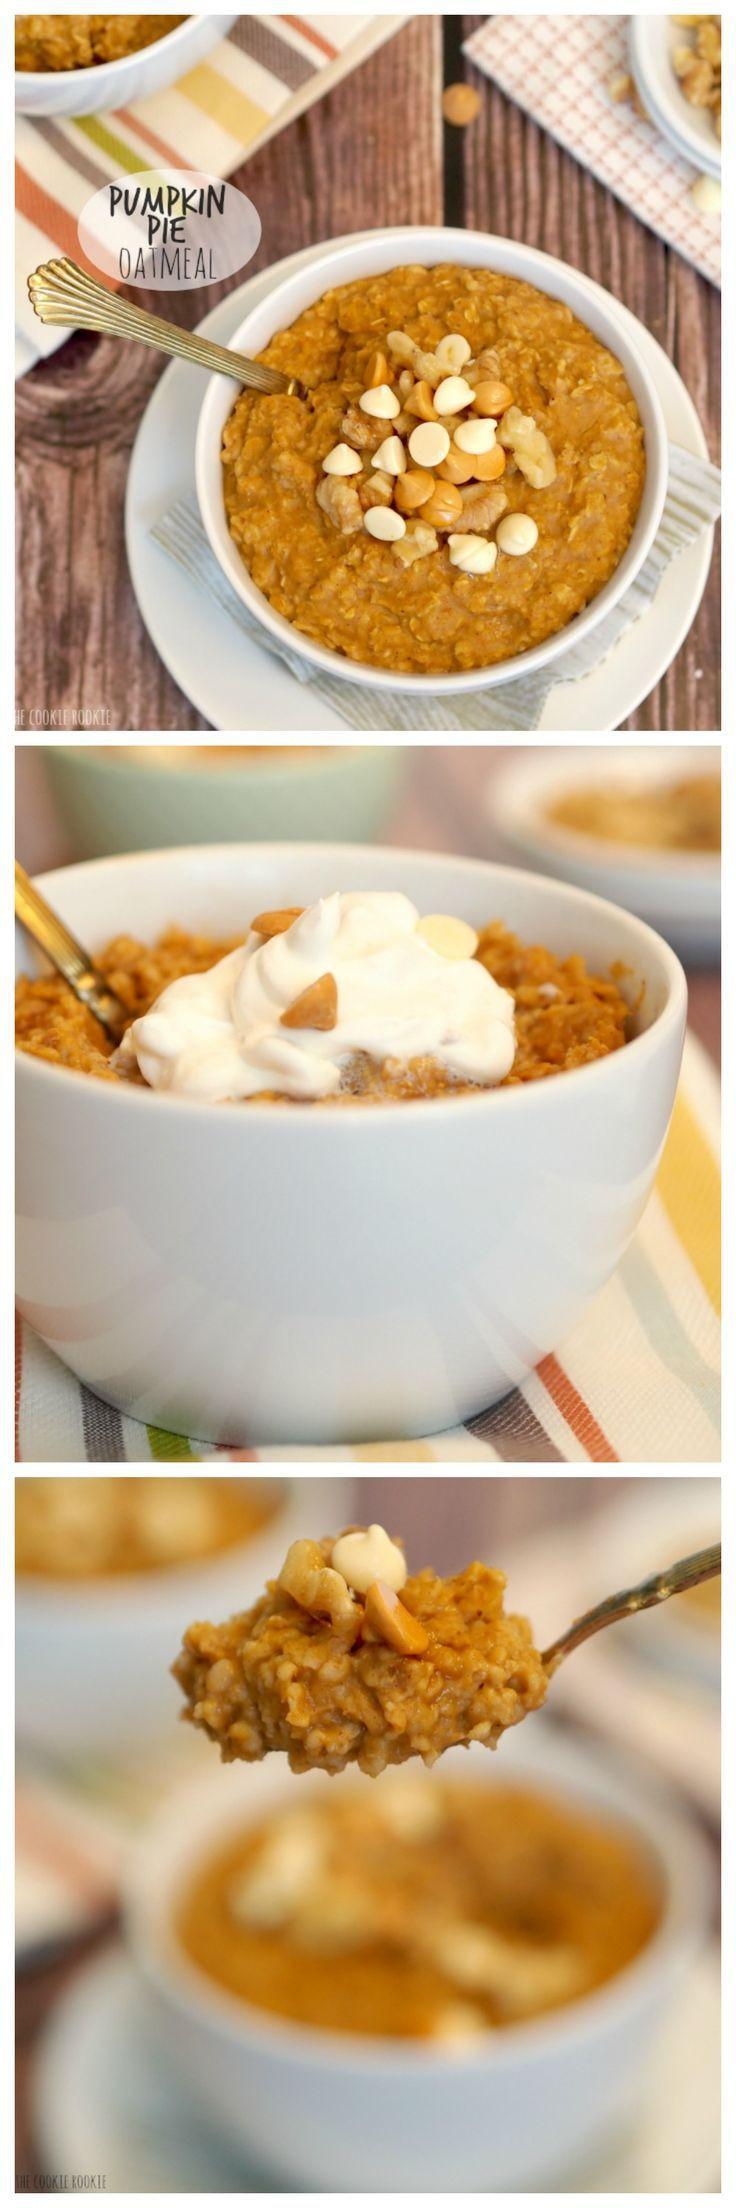 Healthy Fall Breakfast Recipes  Pumpkin Pie Oatmeal The perfect healthy breakfast for